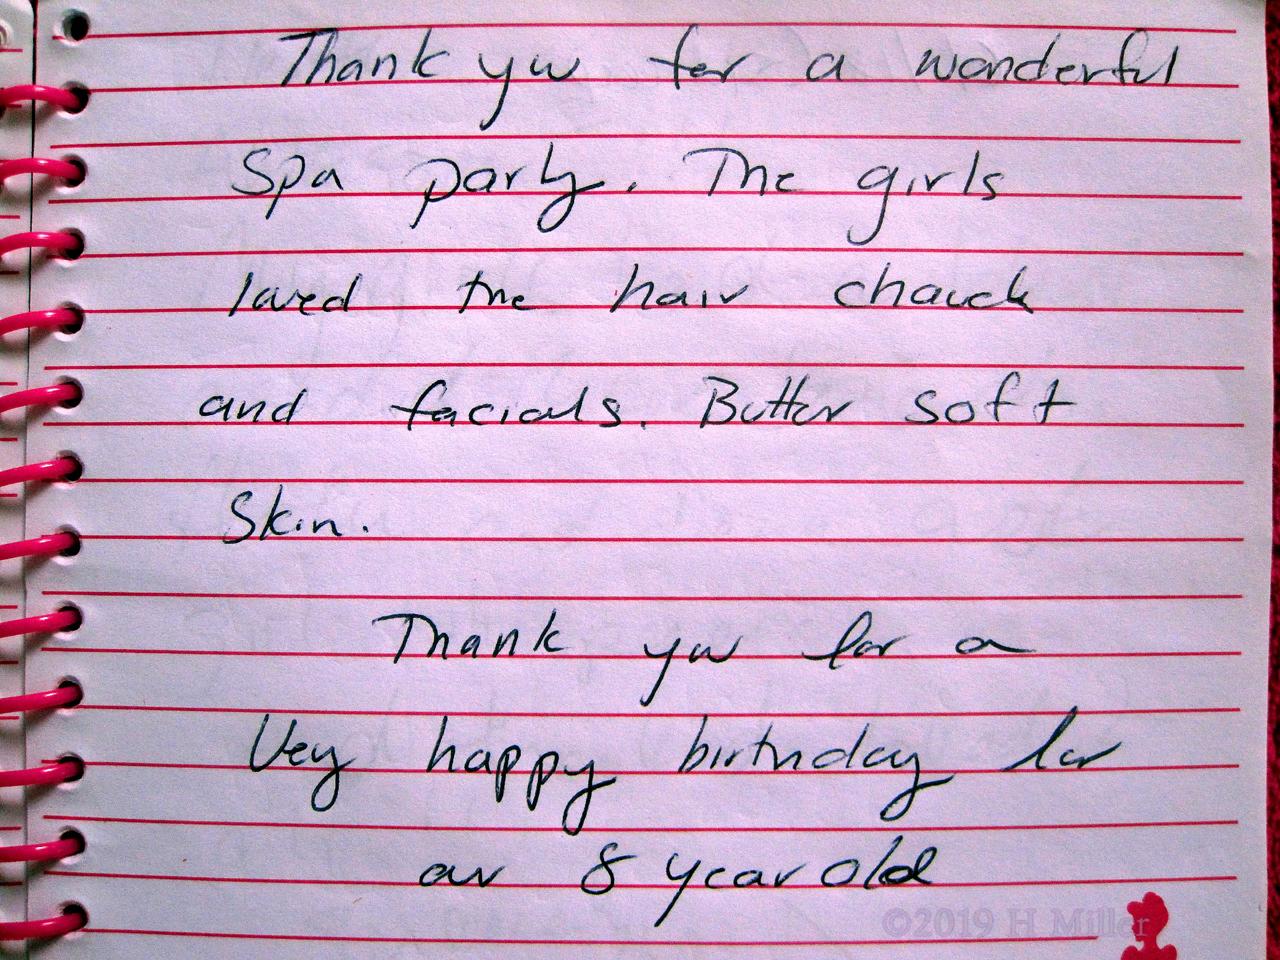 Sydney's Girls Spa Review